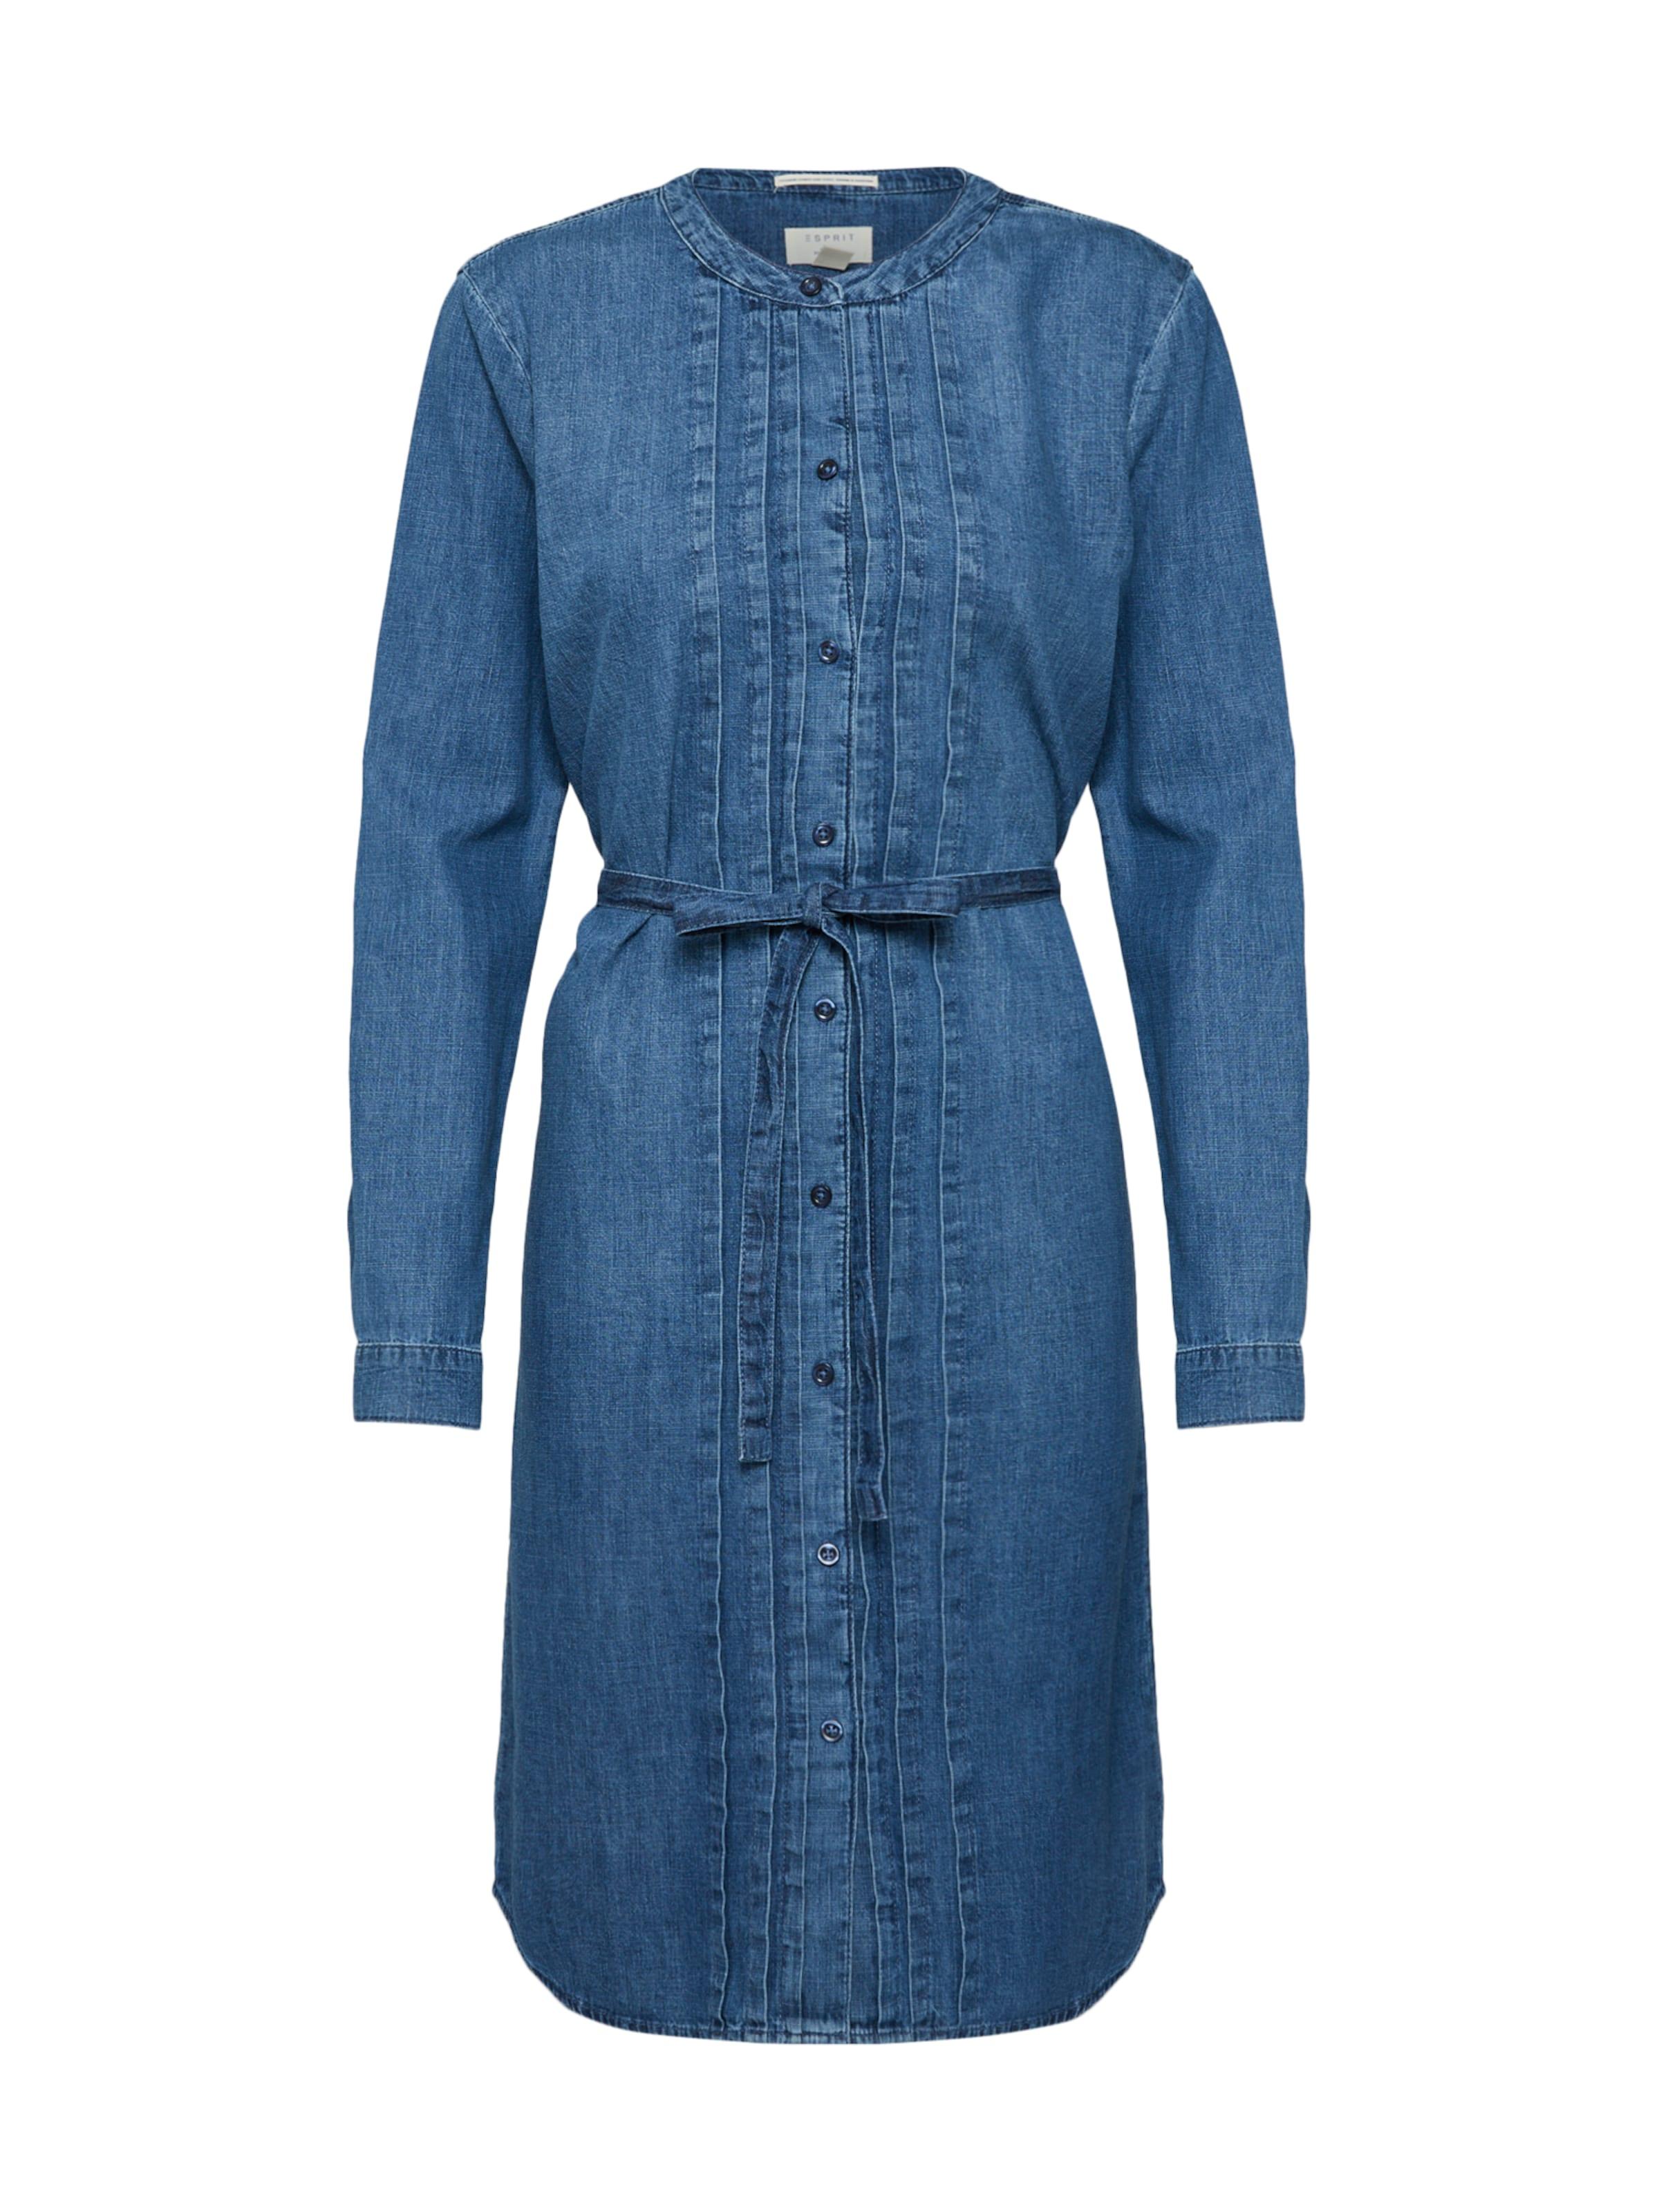 Denim Robe Esprit Esprit En Bleu 45R3jAL